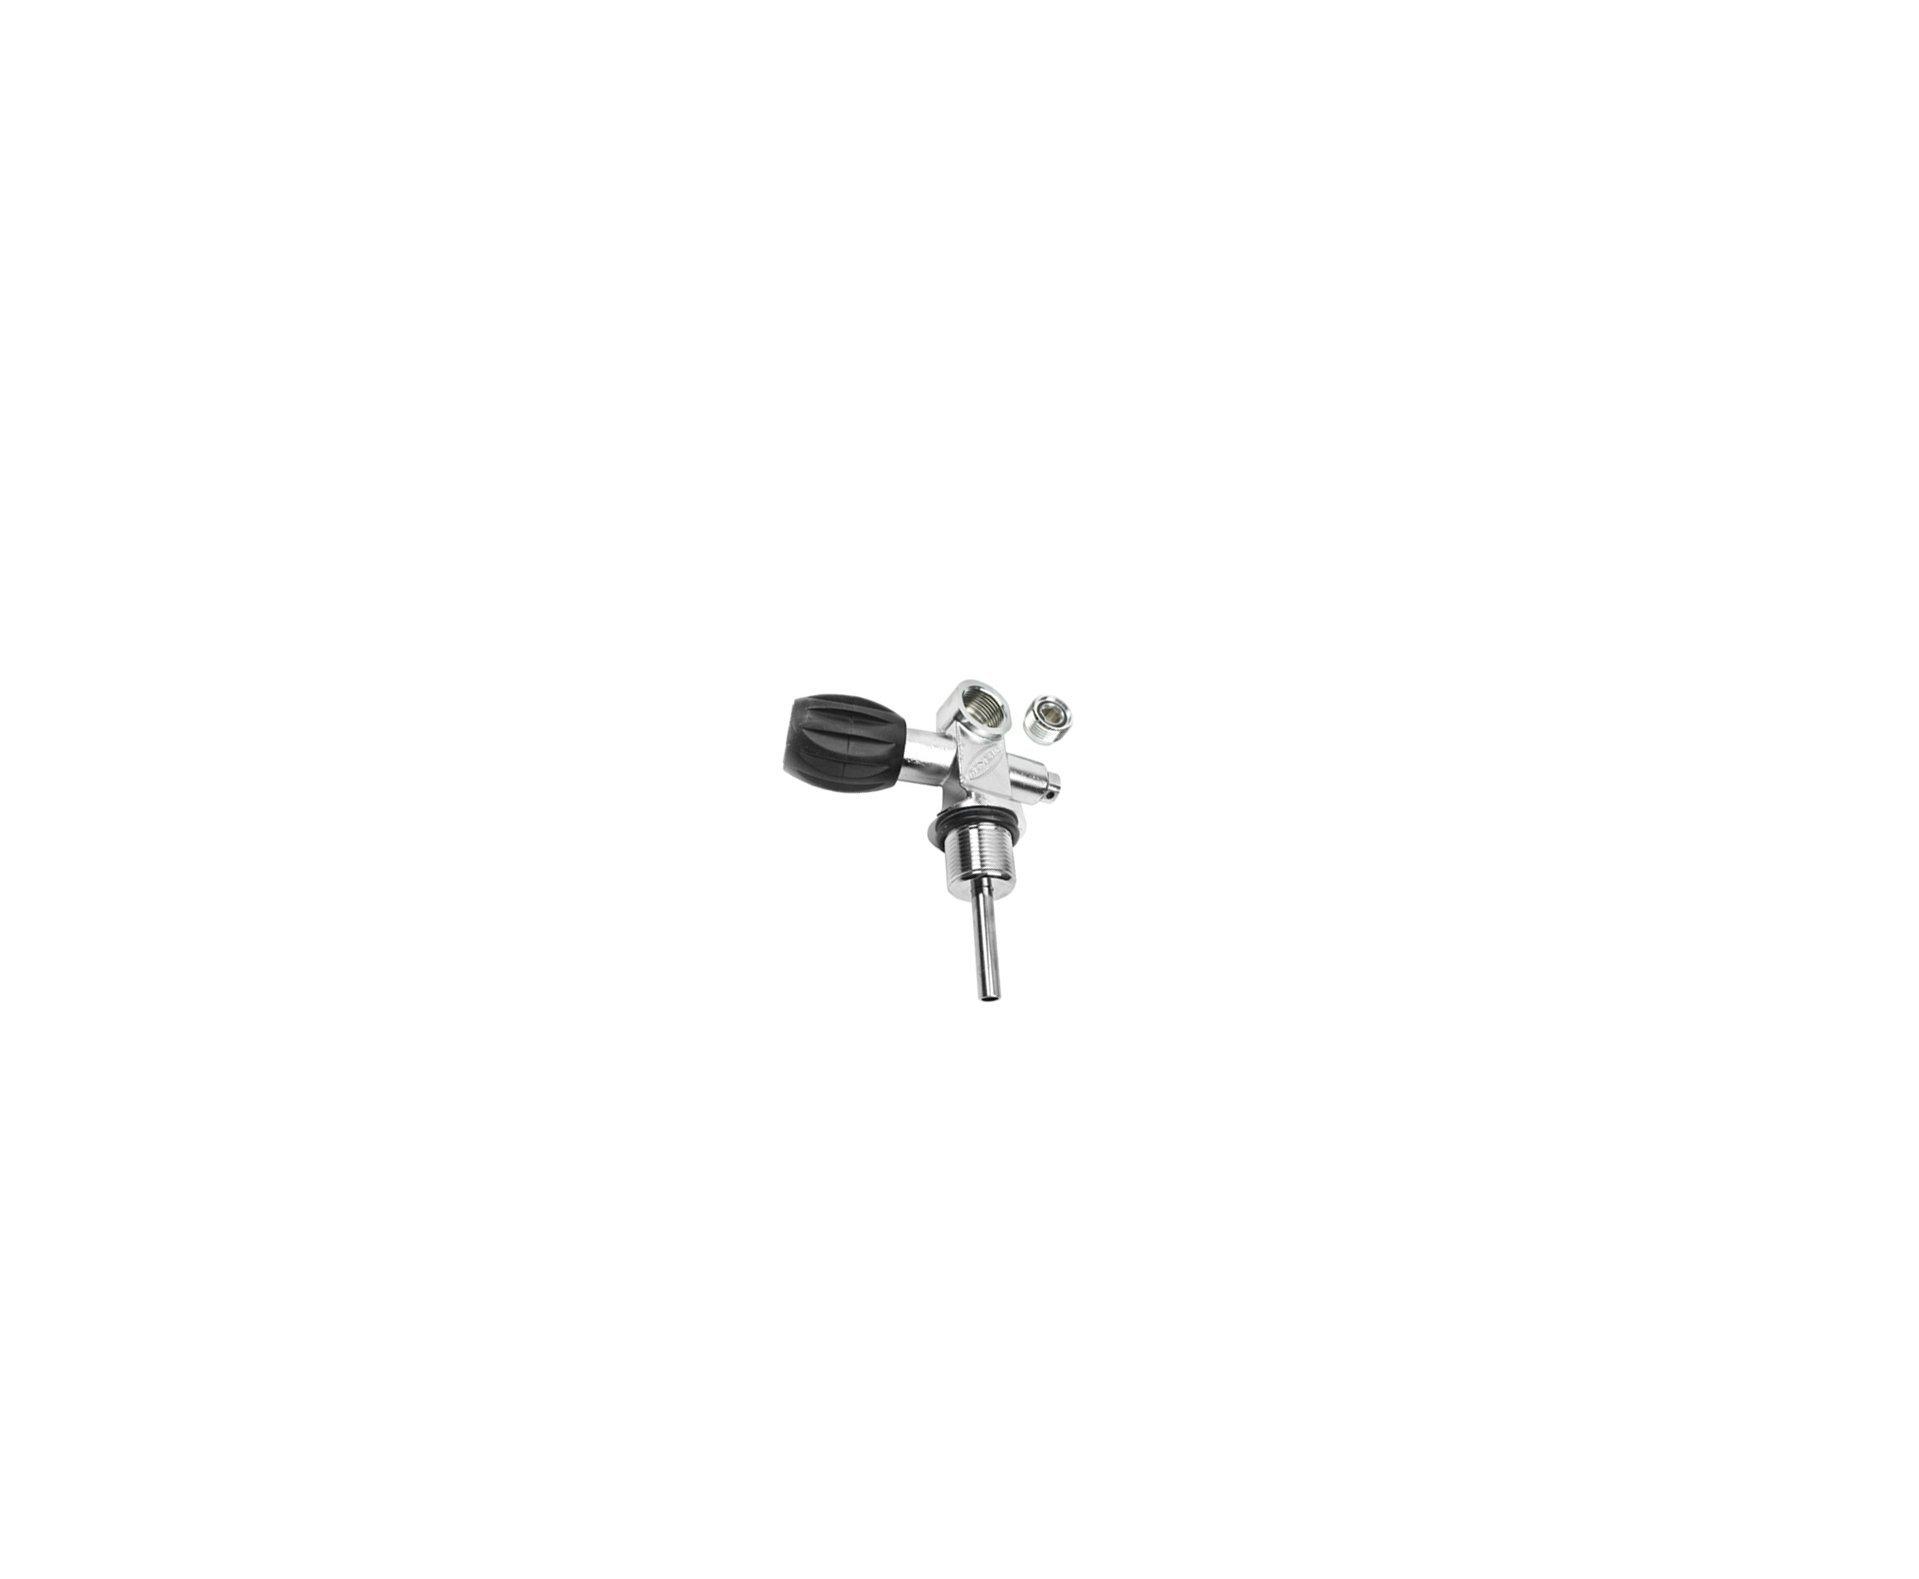 Cilindro Scuba 10lts + Valvula Yoke + Adaptador Recarga Para Pcp